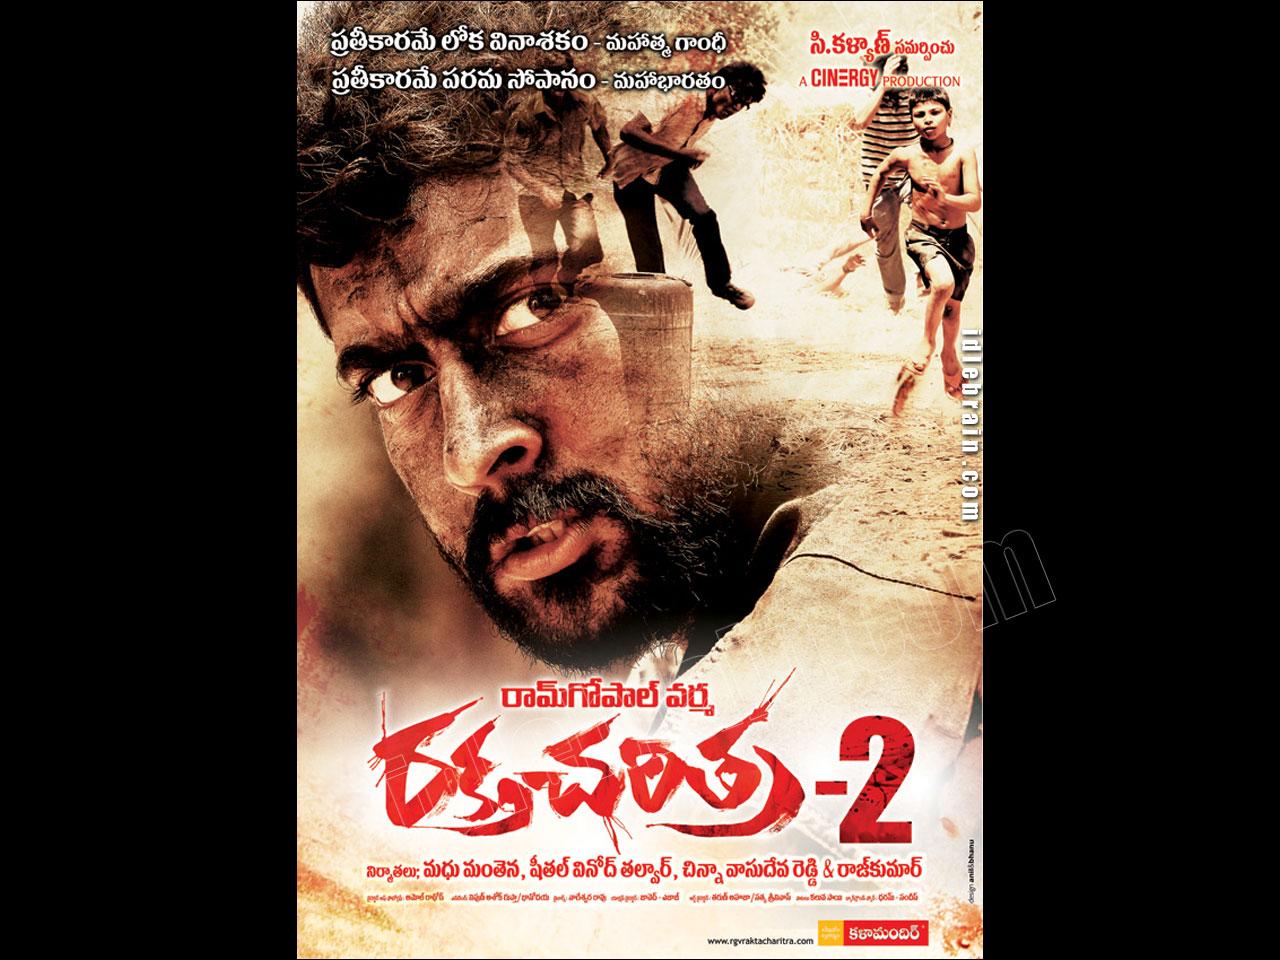 Cine Film Actors Rakta Charitra: Rakta Charitra 2 - Telugu Movie Wallpapers